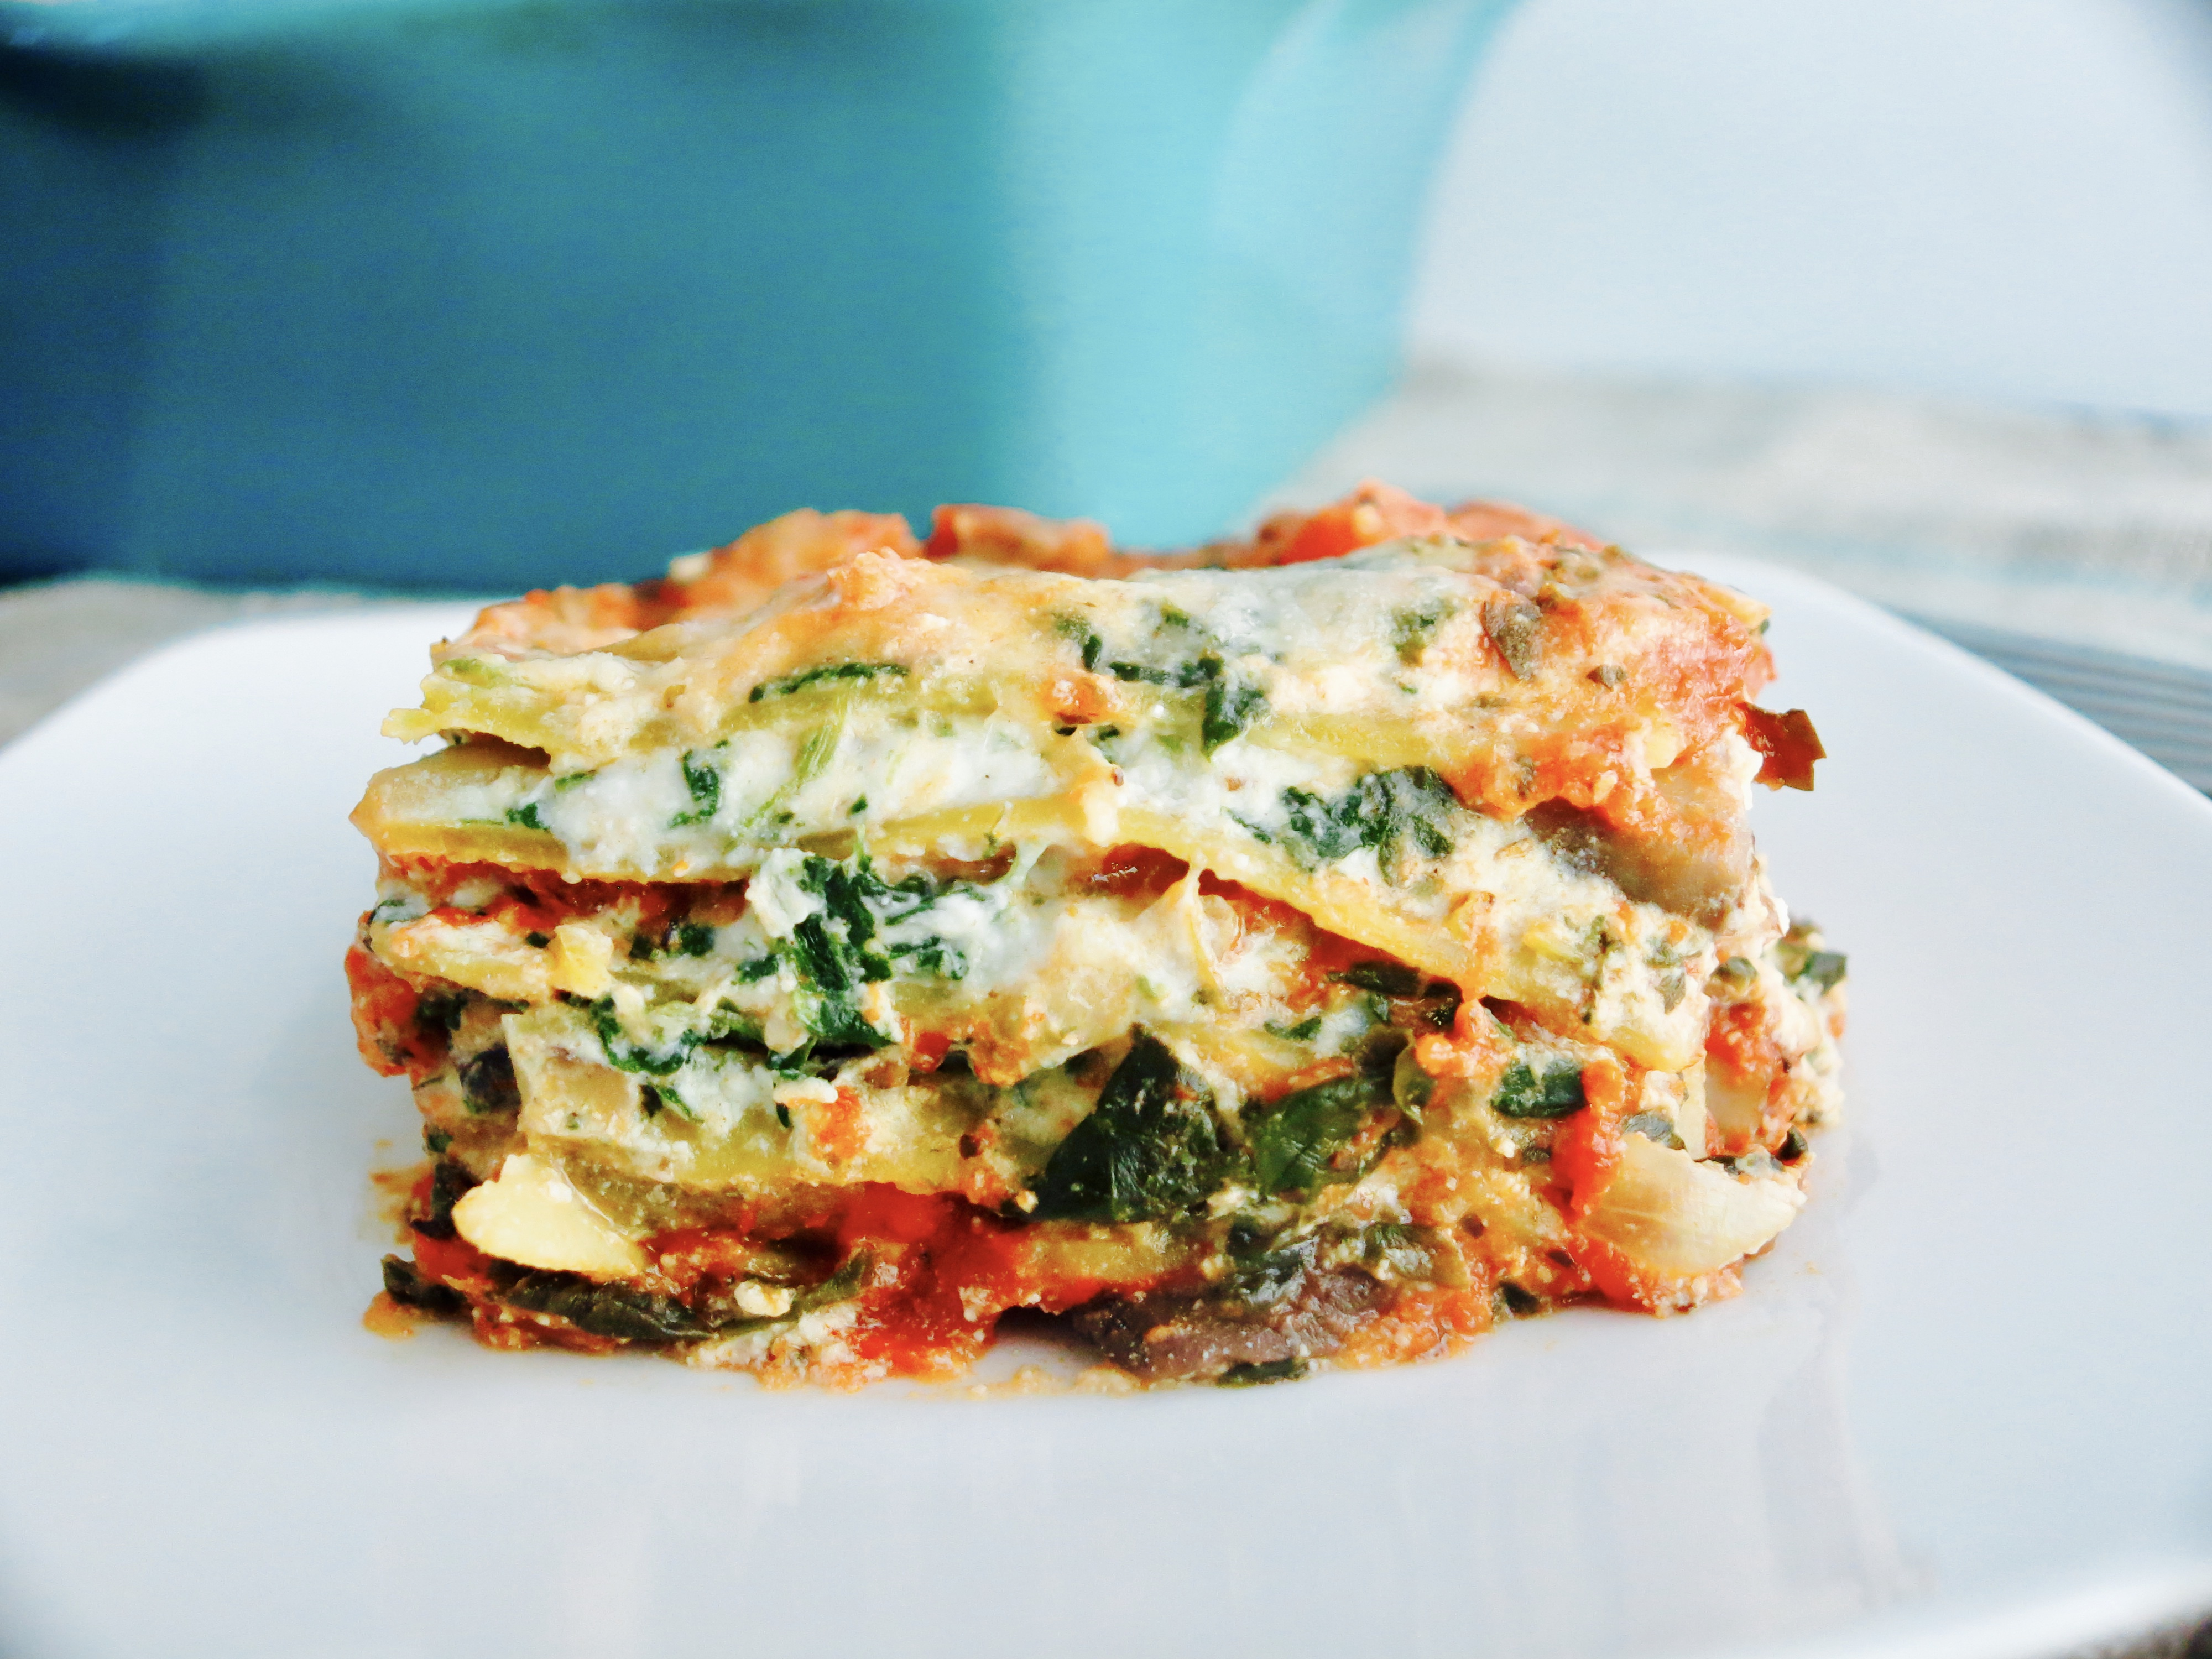 Skinny Spinach and Mushroom Lasagna